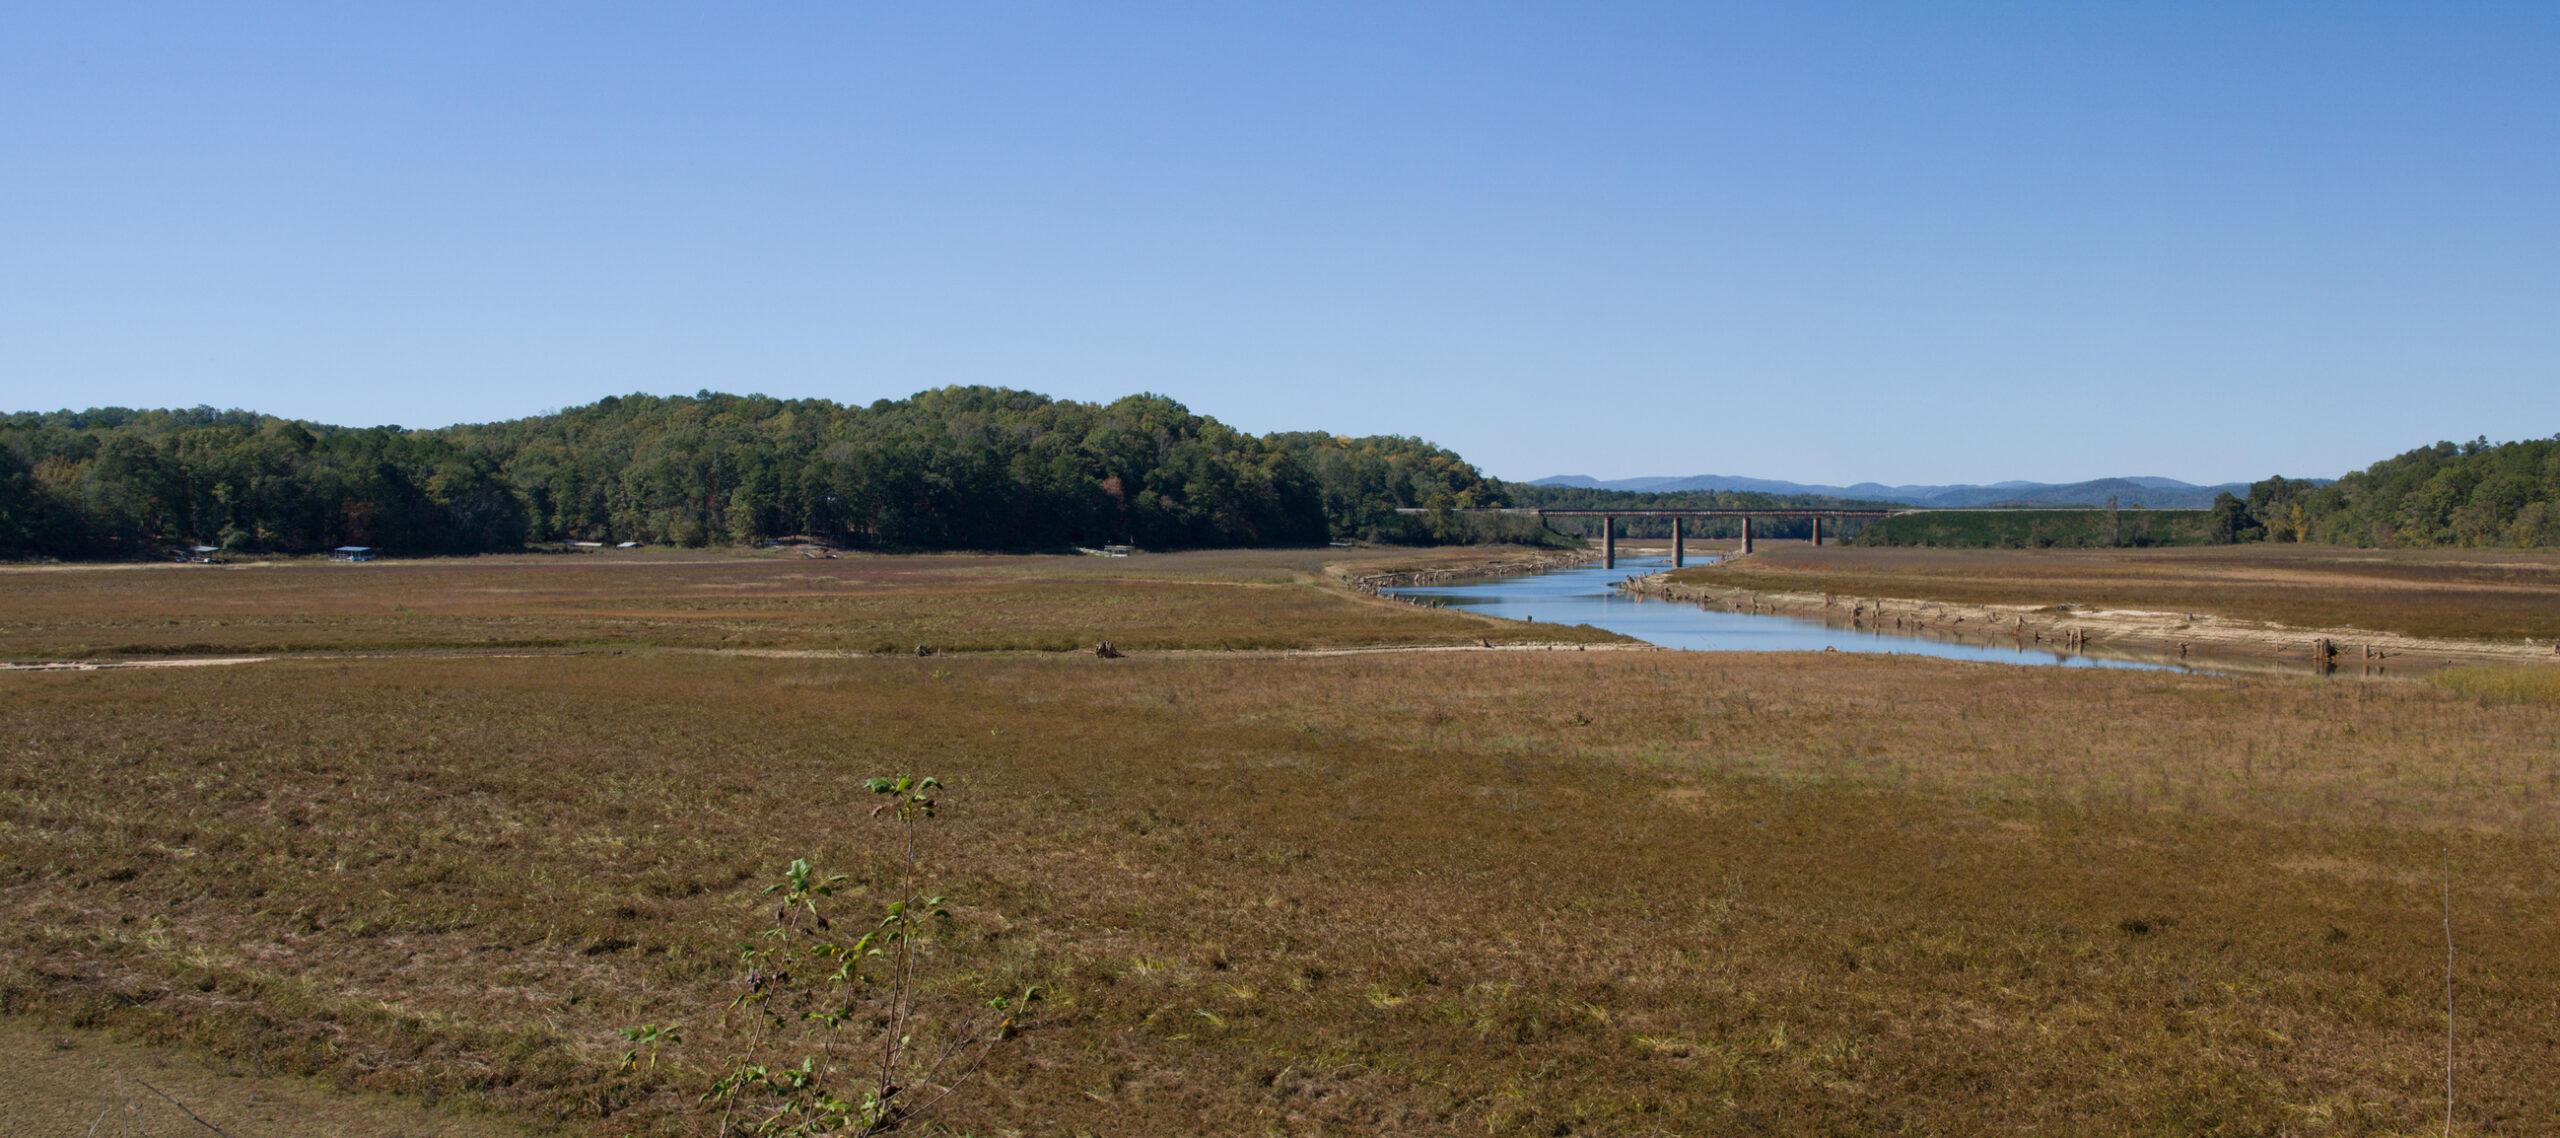 Historic 18 foot drought to the 56,000 Acre Lake Hartwell near Toccoa  Georgia